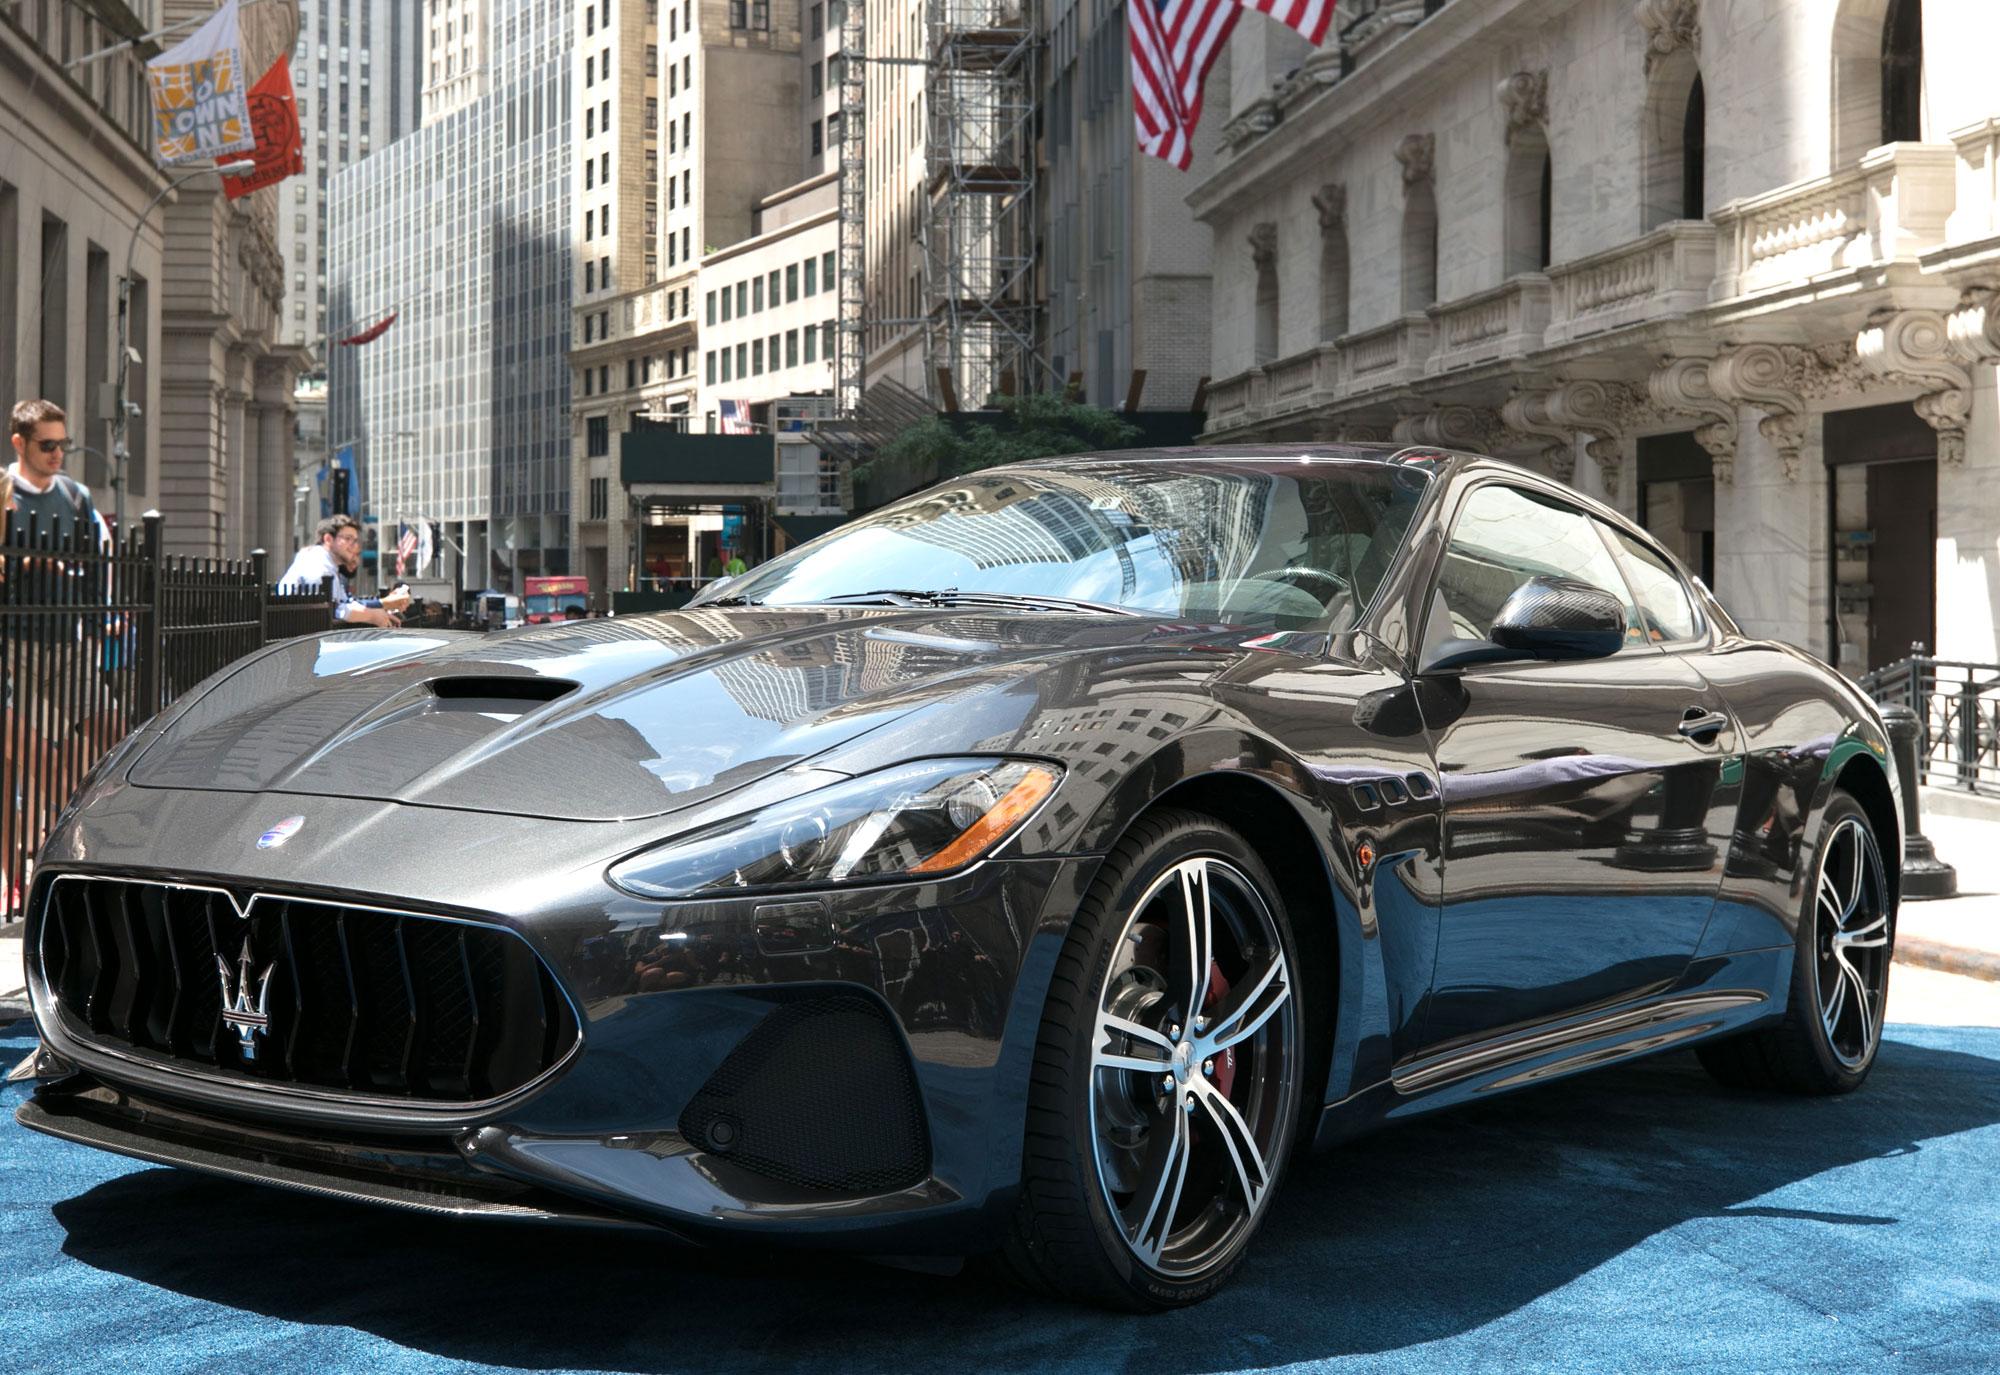 Maserati-GranTurismo-MC-MY18-at-New-York-Stock-Exchange_2017_2.jpg